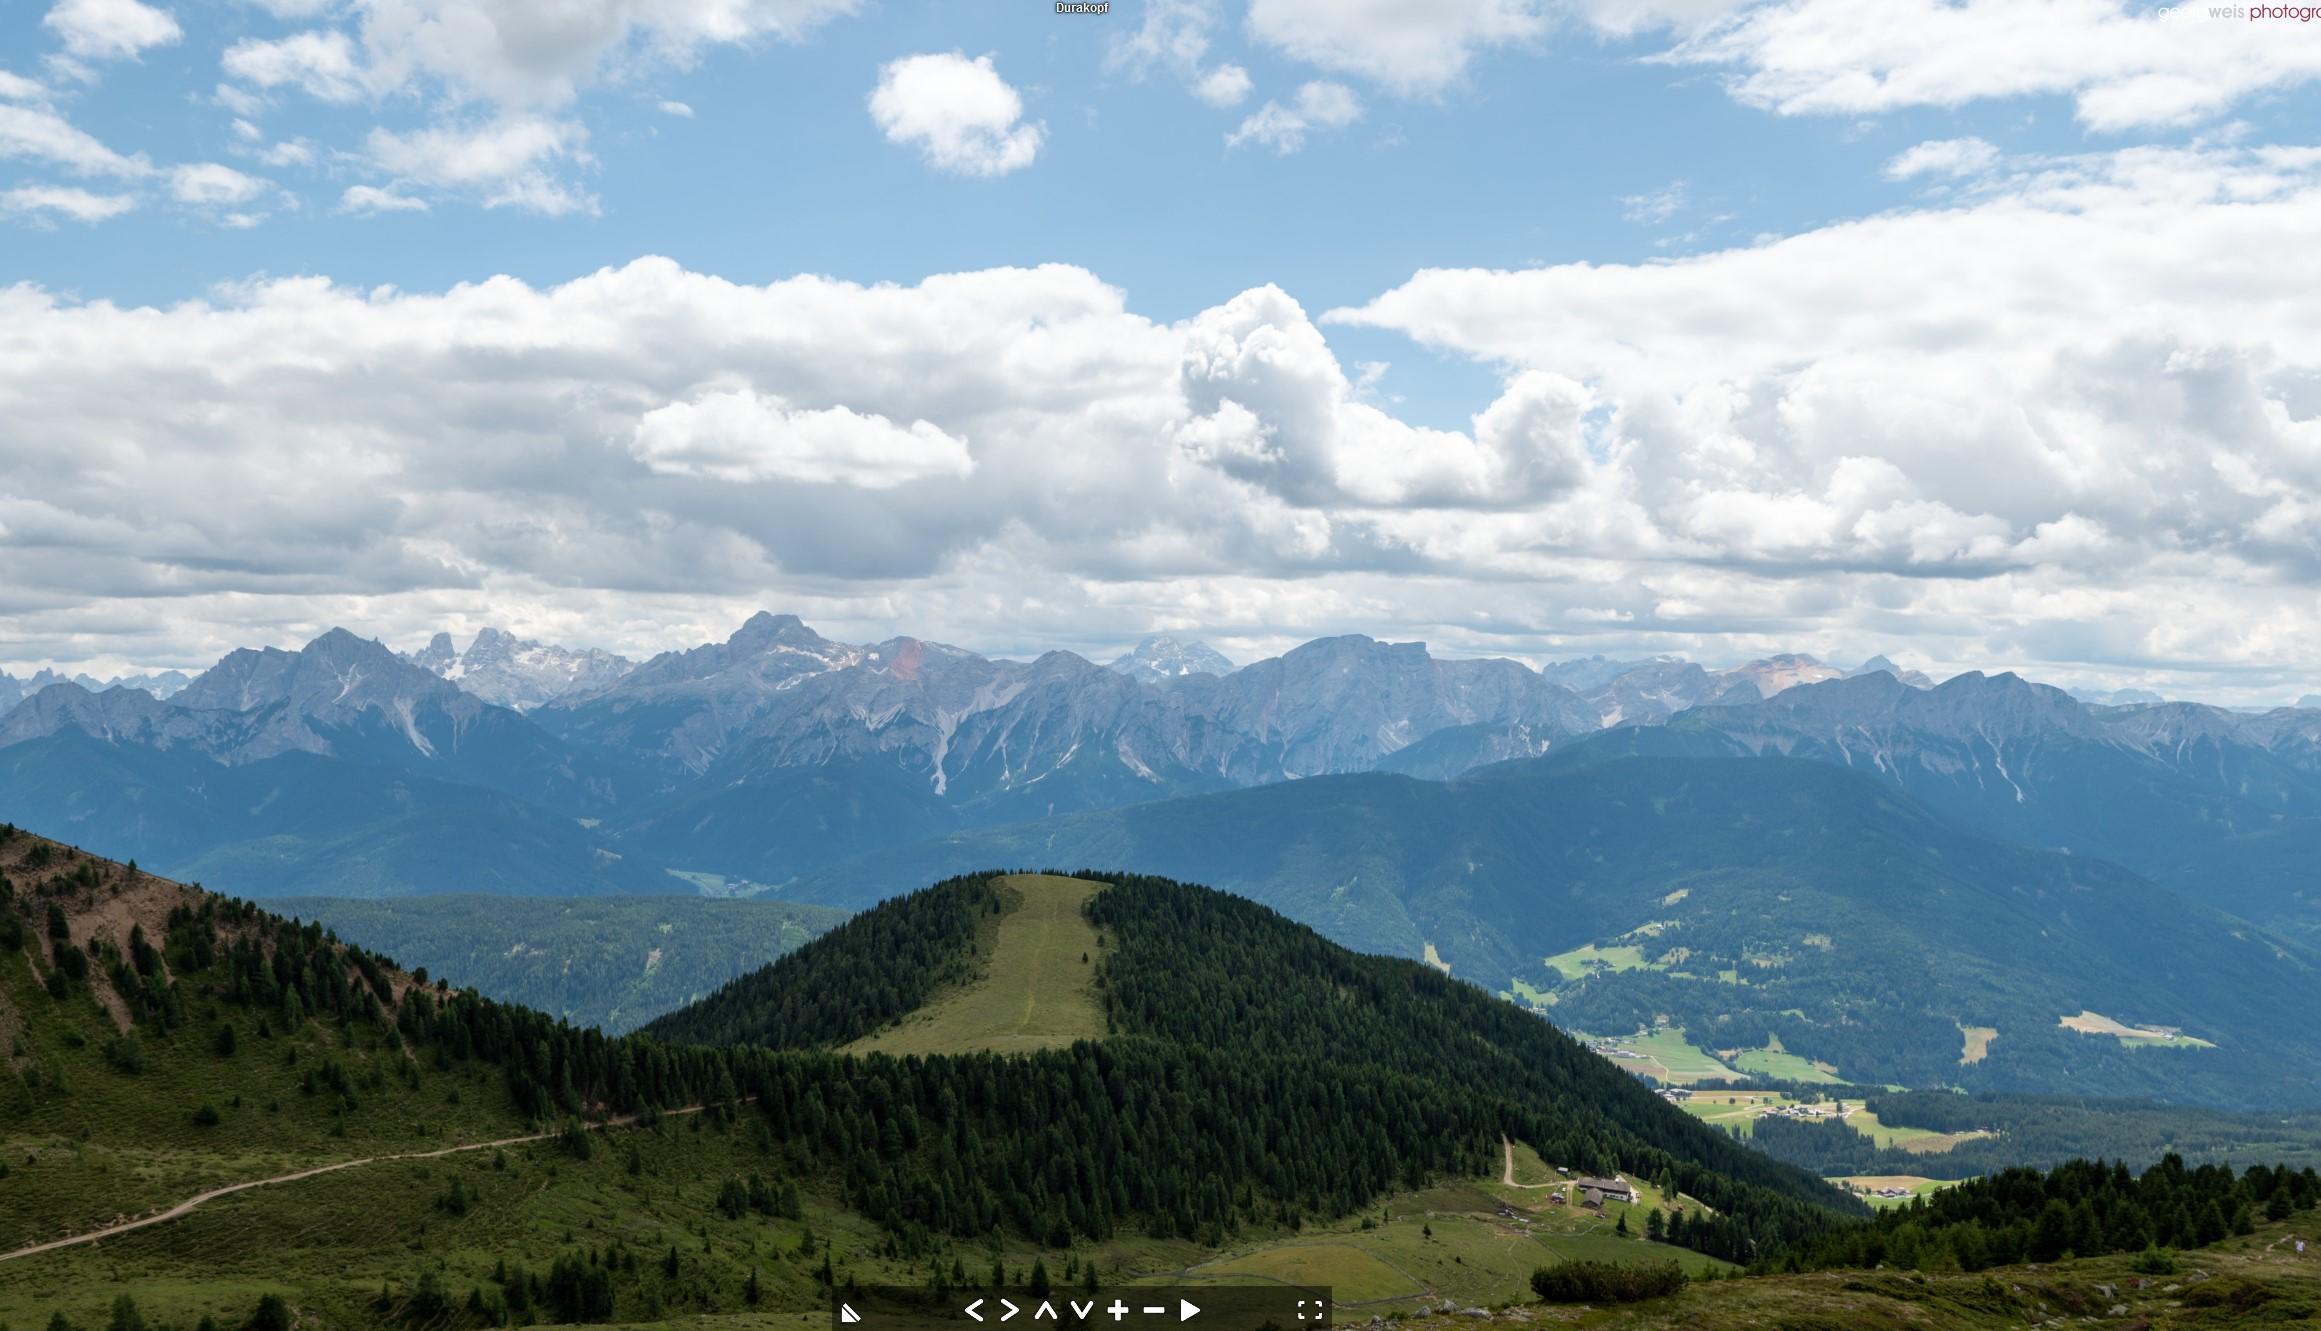 Durakopf (2275m), Taisten / Welsberg